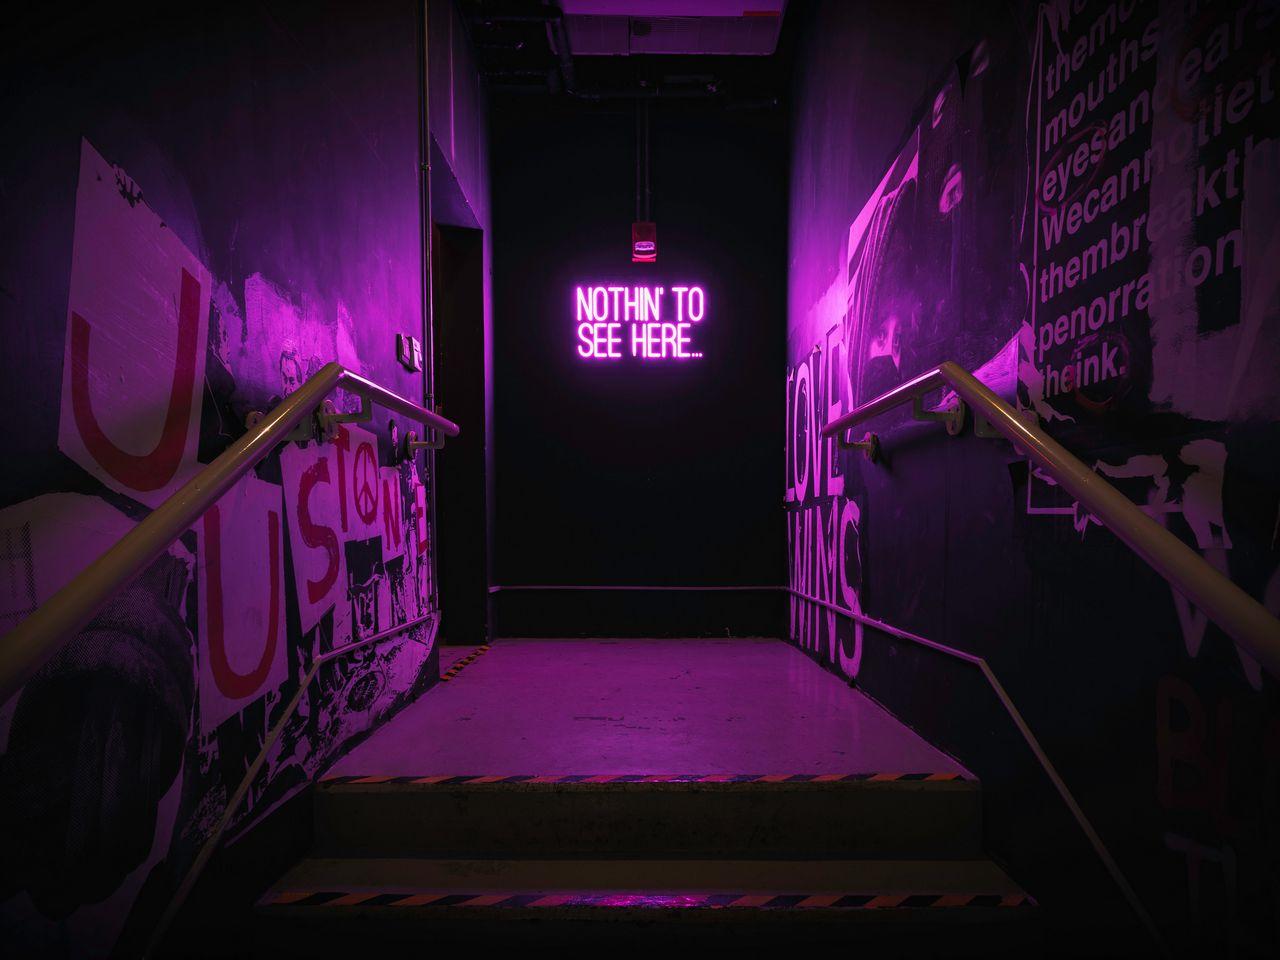 1280x960 Wallpaper neon, inscription, wall, purple, backlight